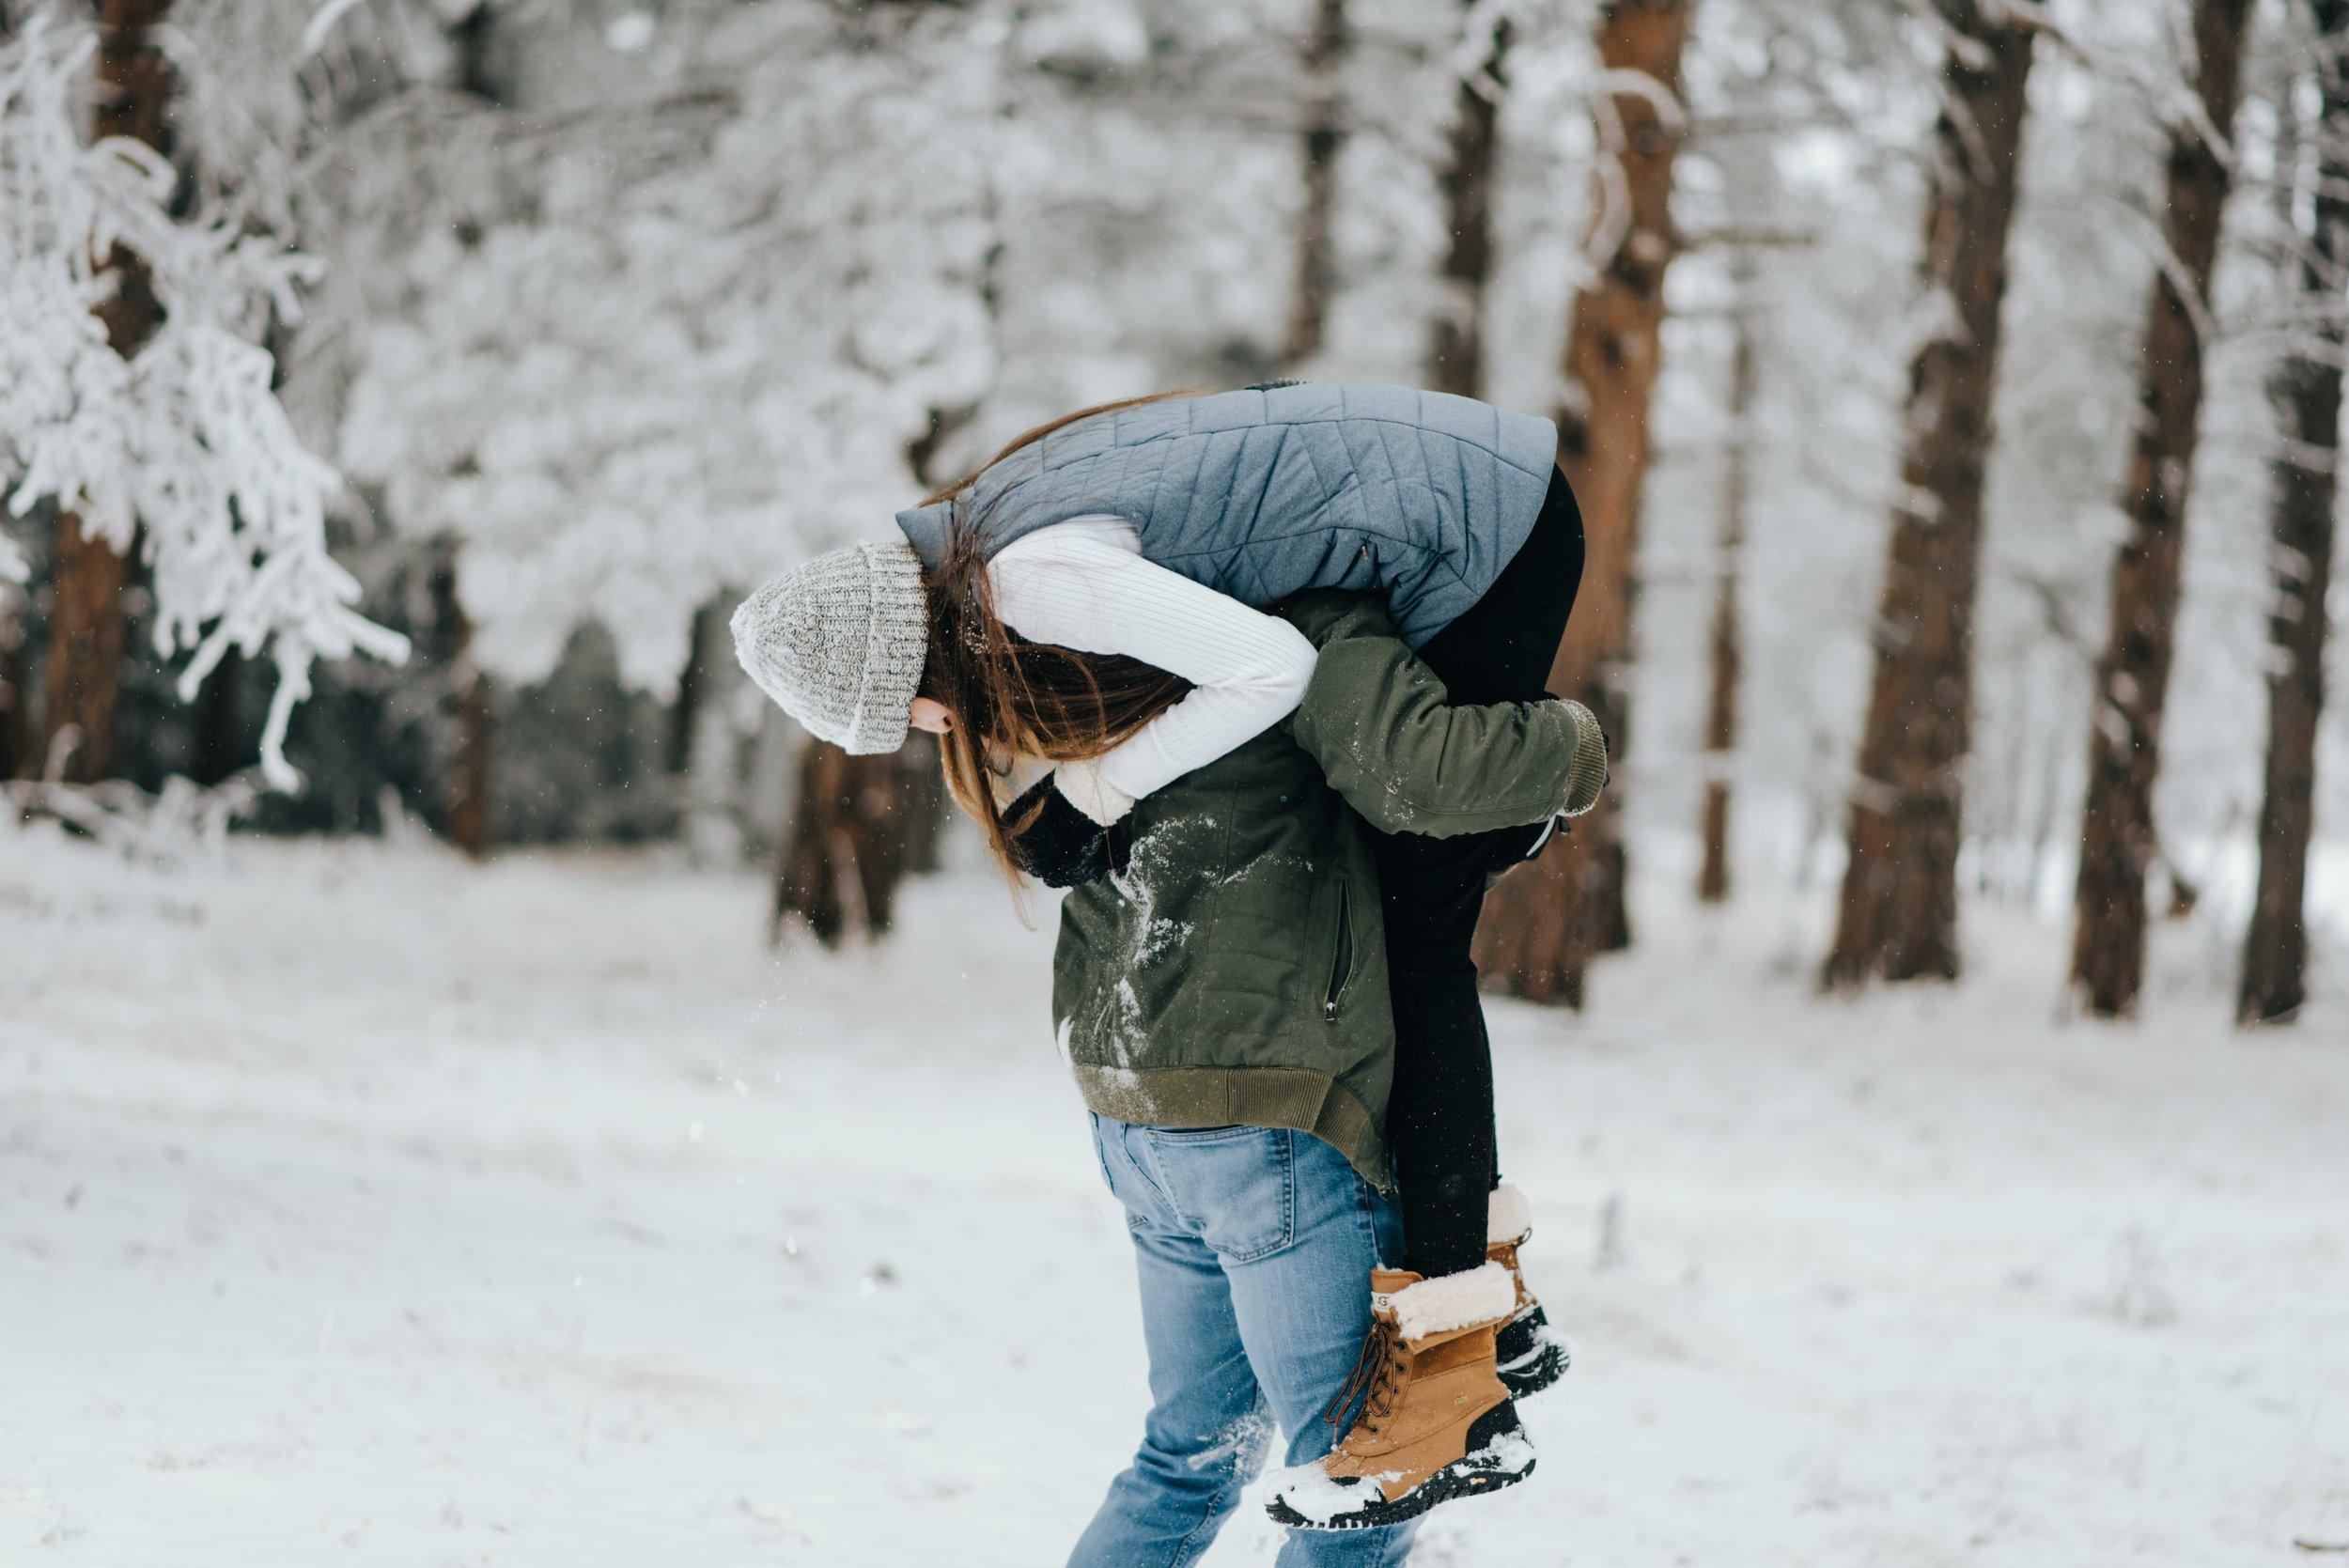 Nik picking Tani up during their epic snowball fight.